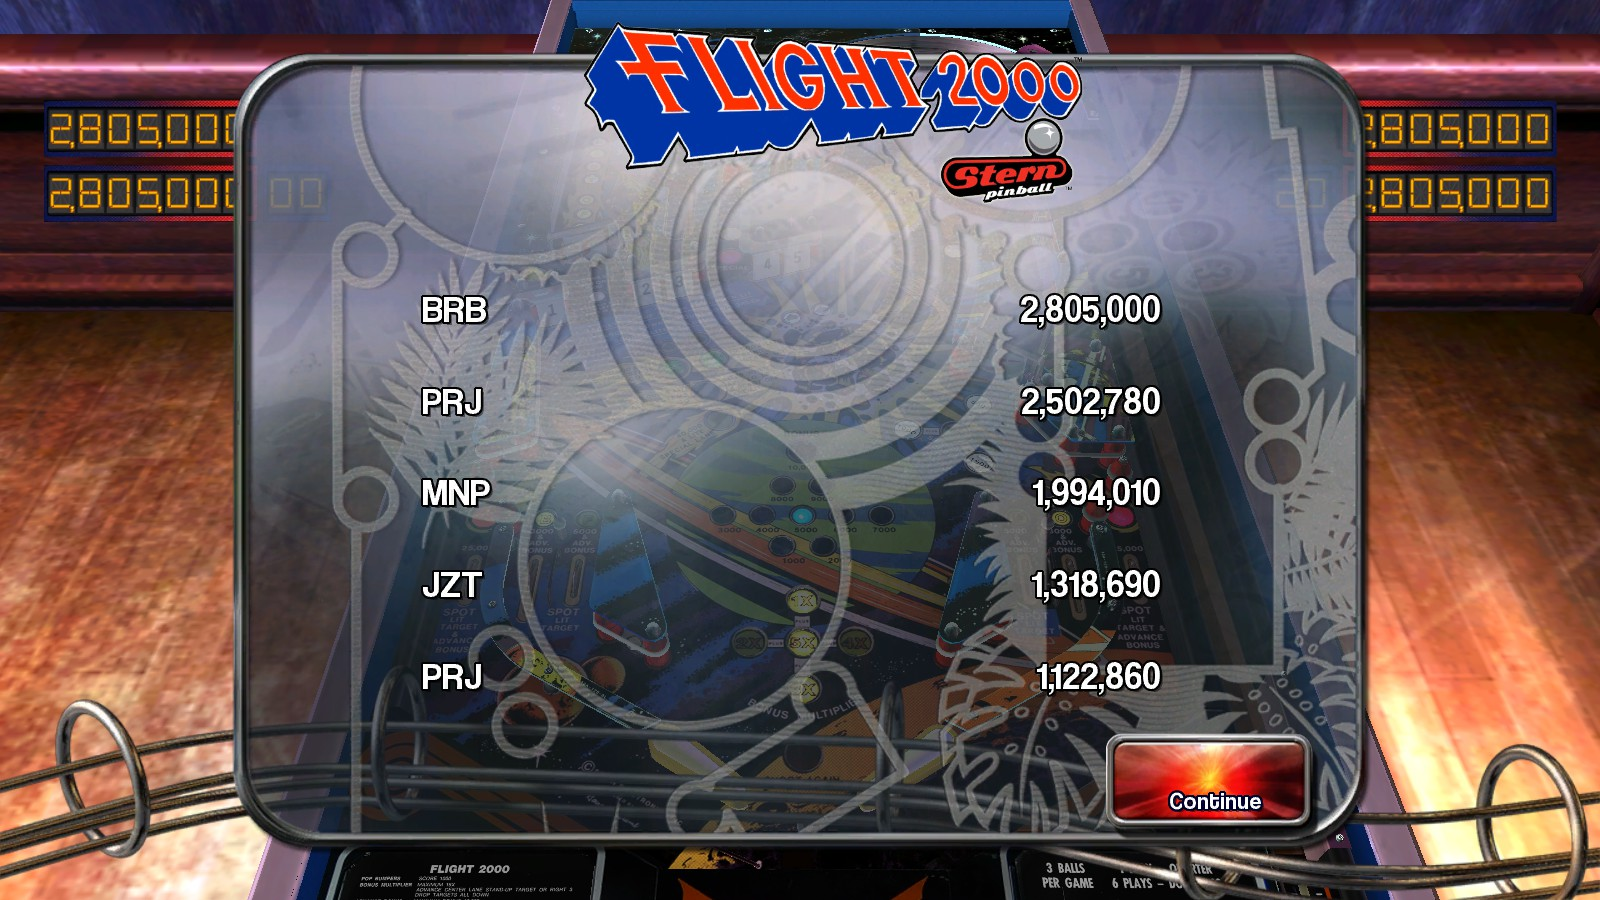 Deteacher: Pinball Arcade: Flight 2000 (PC) 2,502,780 points on 2015-08-23 17:51:23